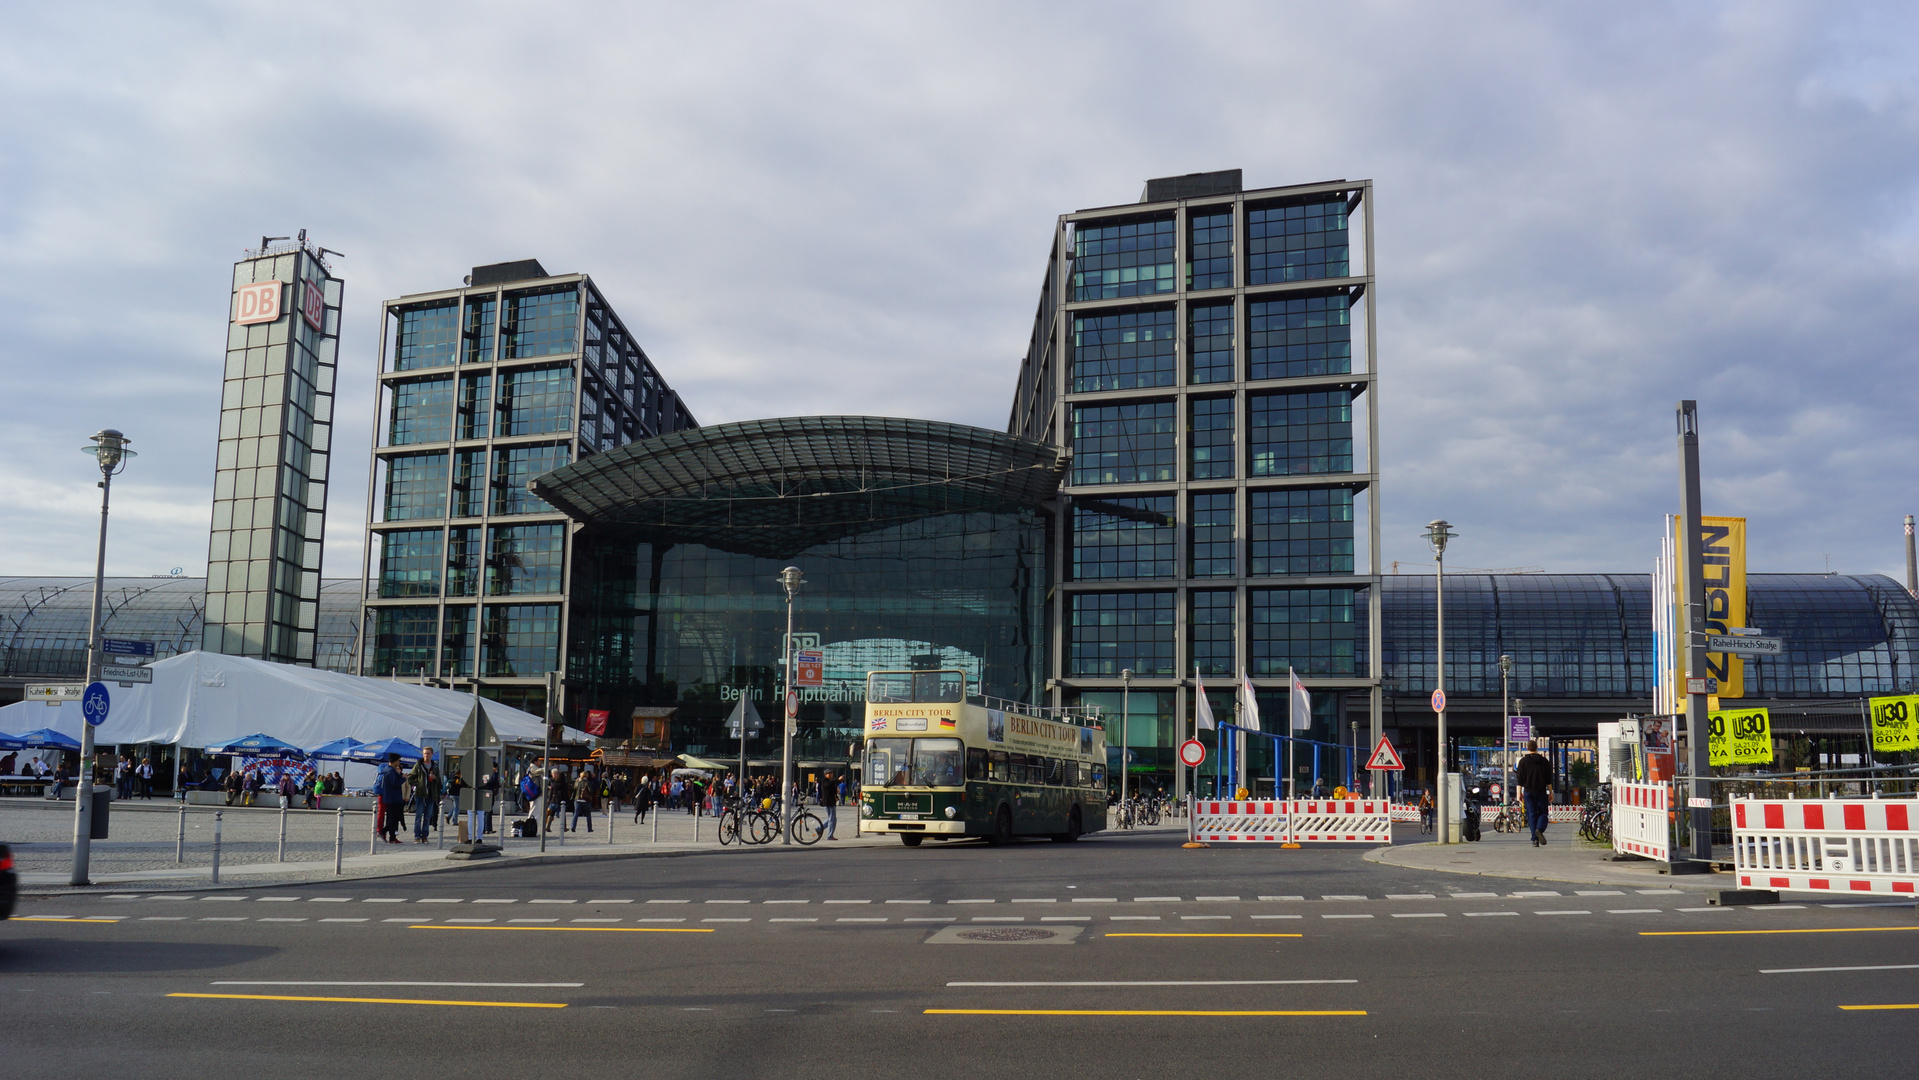 Bln. Hauptbahnhof